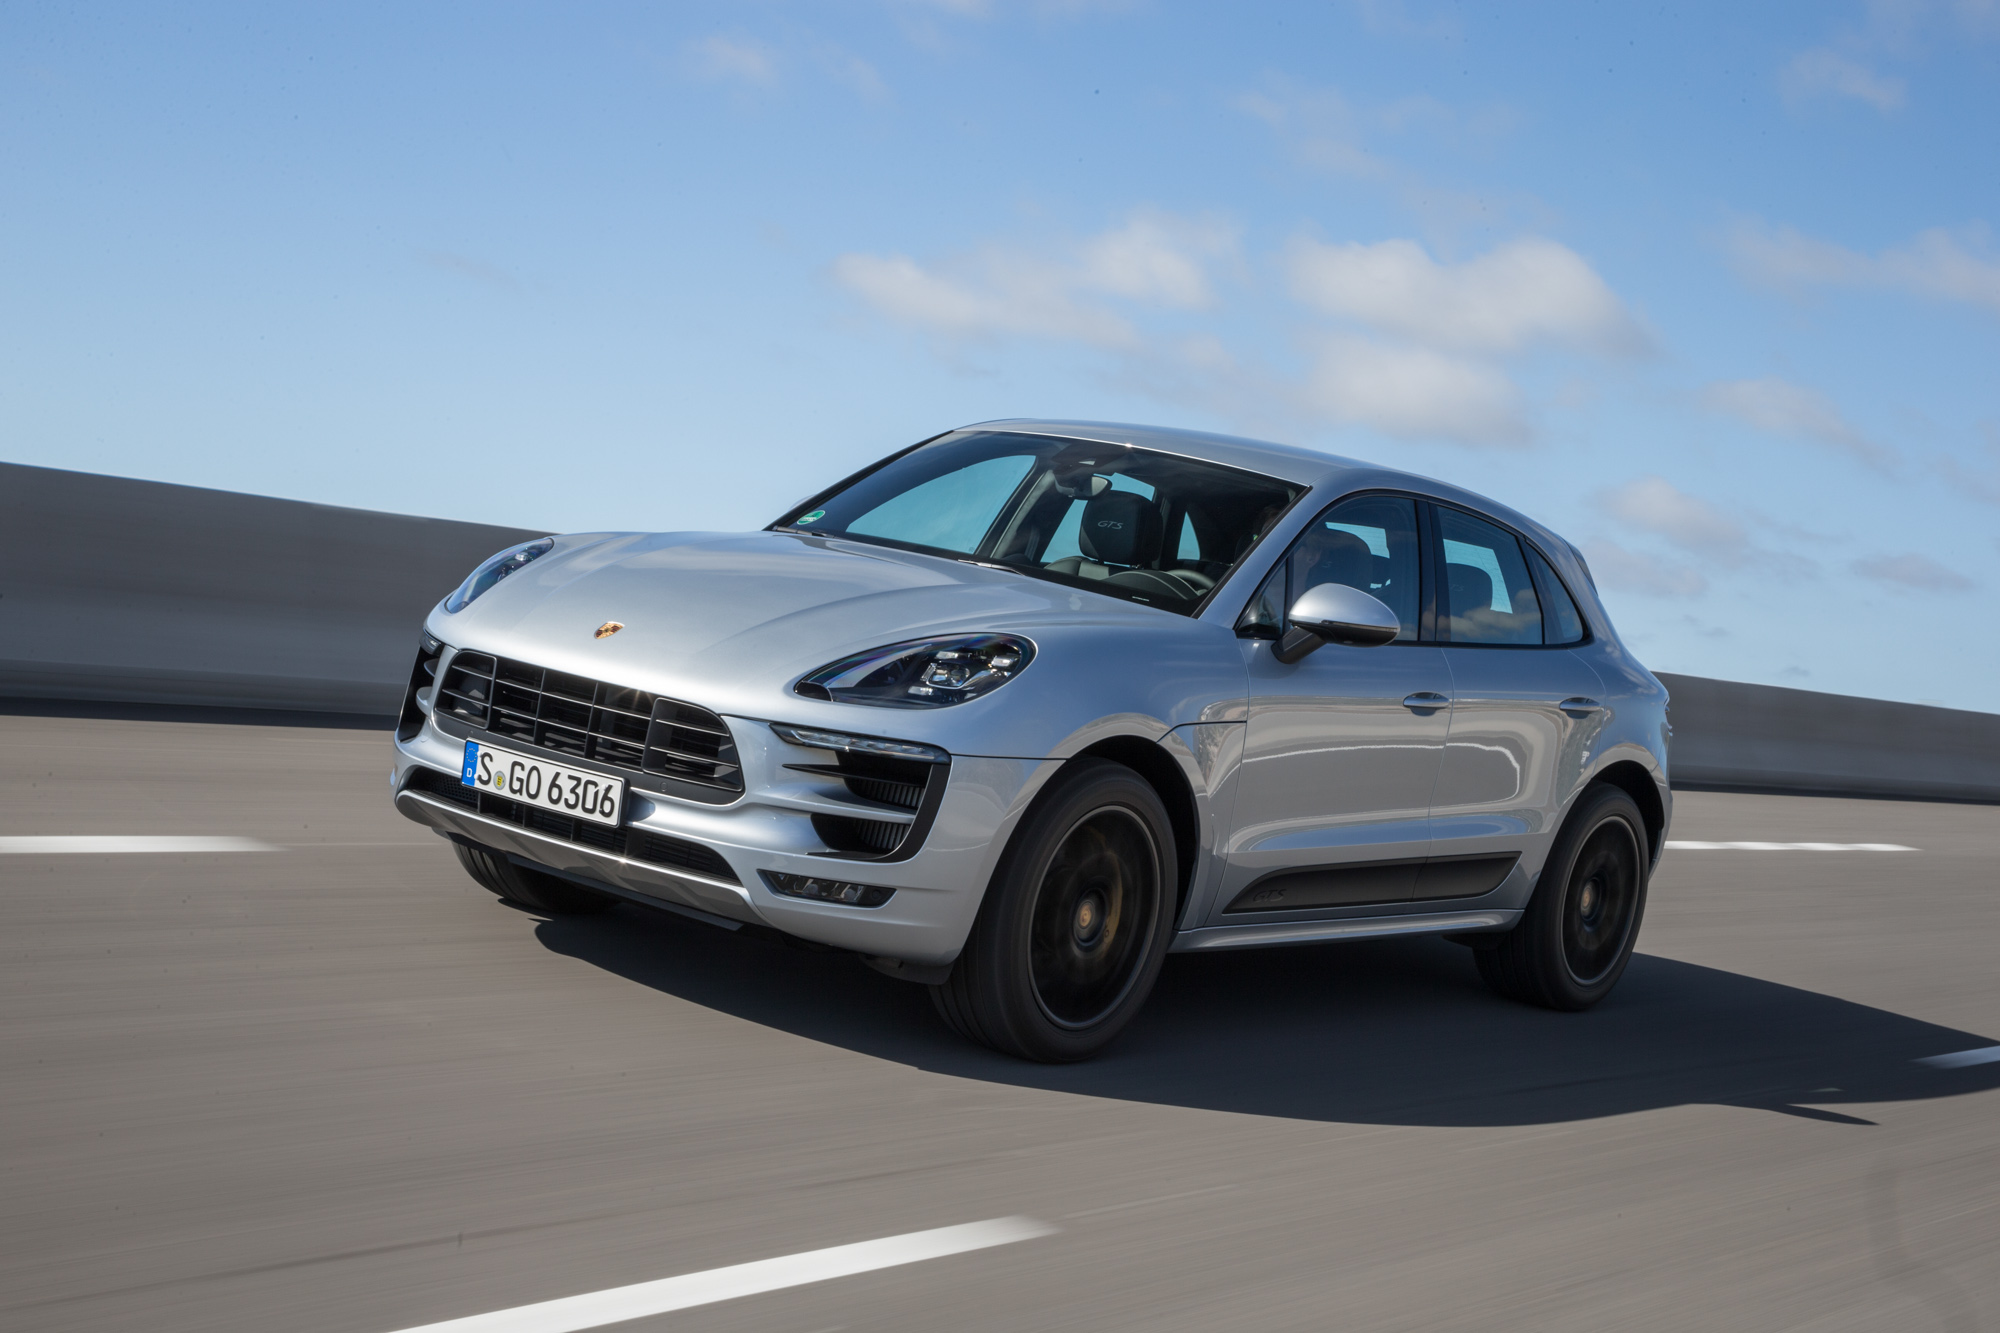 Porsche Macan GTS review - Physics defying fun | Evo